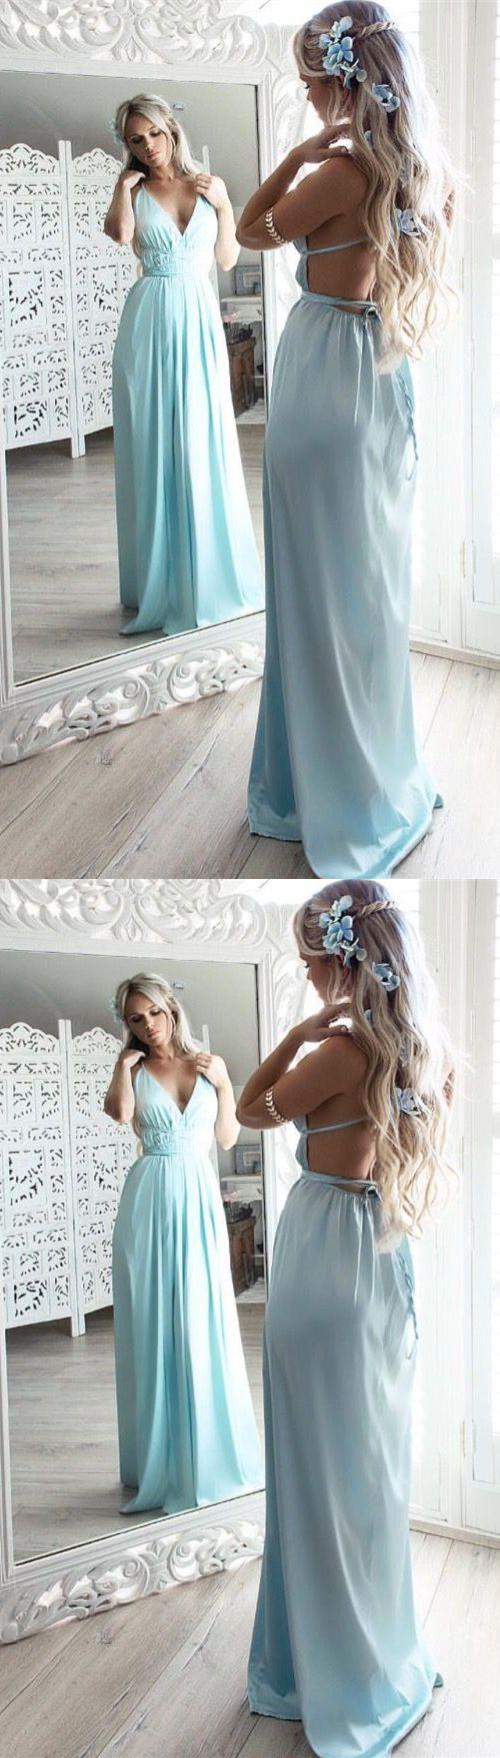 A-Line Prom Dresses,Spaghetti Straps Prom Dresses,Backless Prom ...